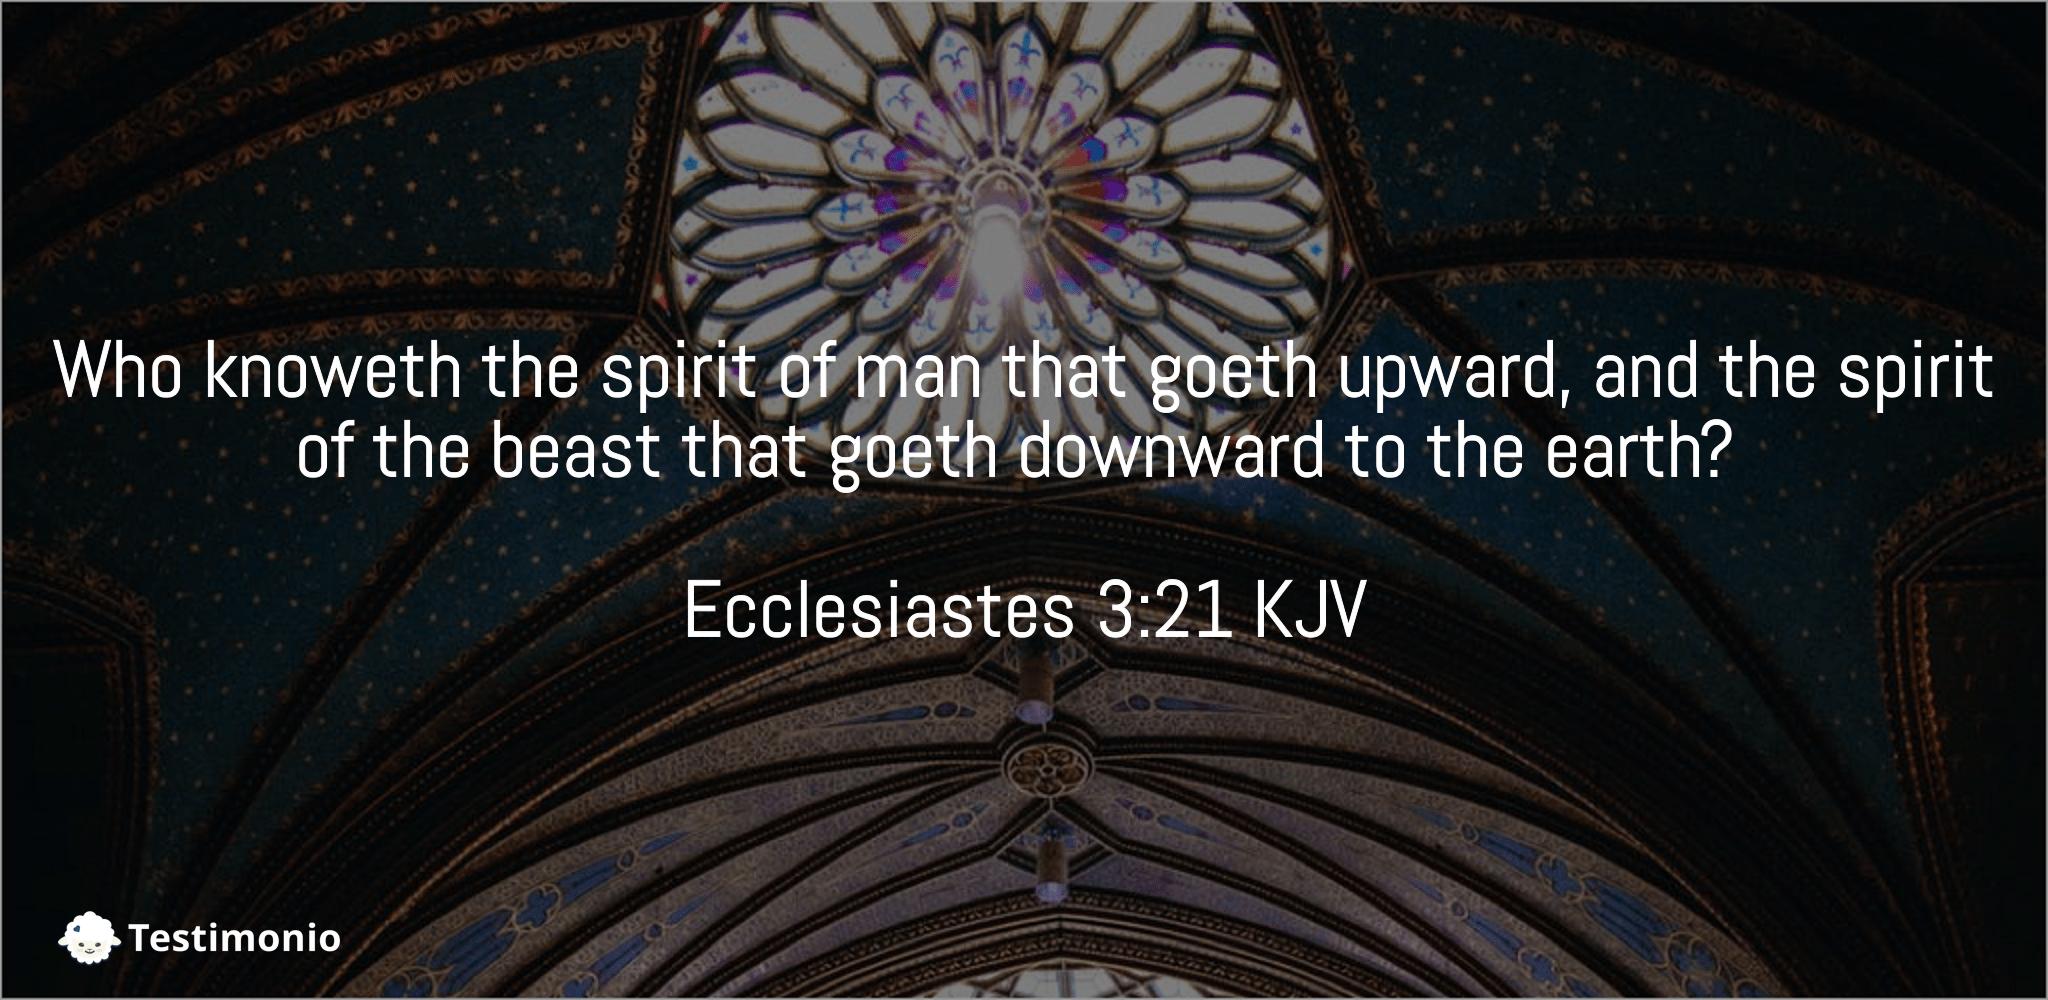 Ecclesiastes 3:21